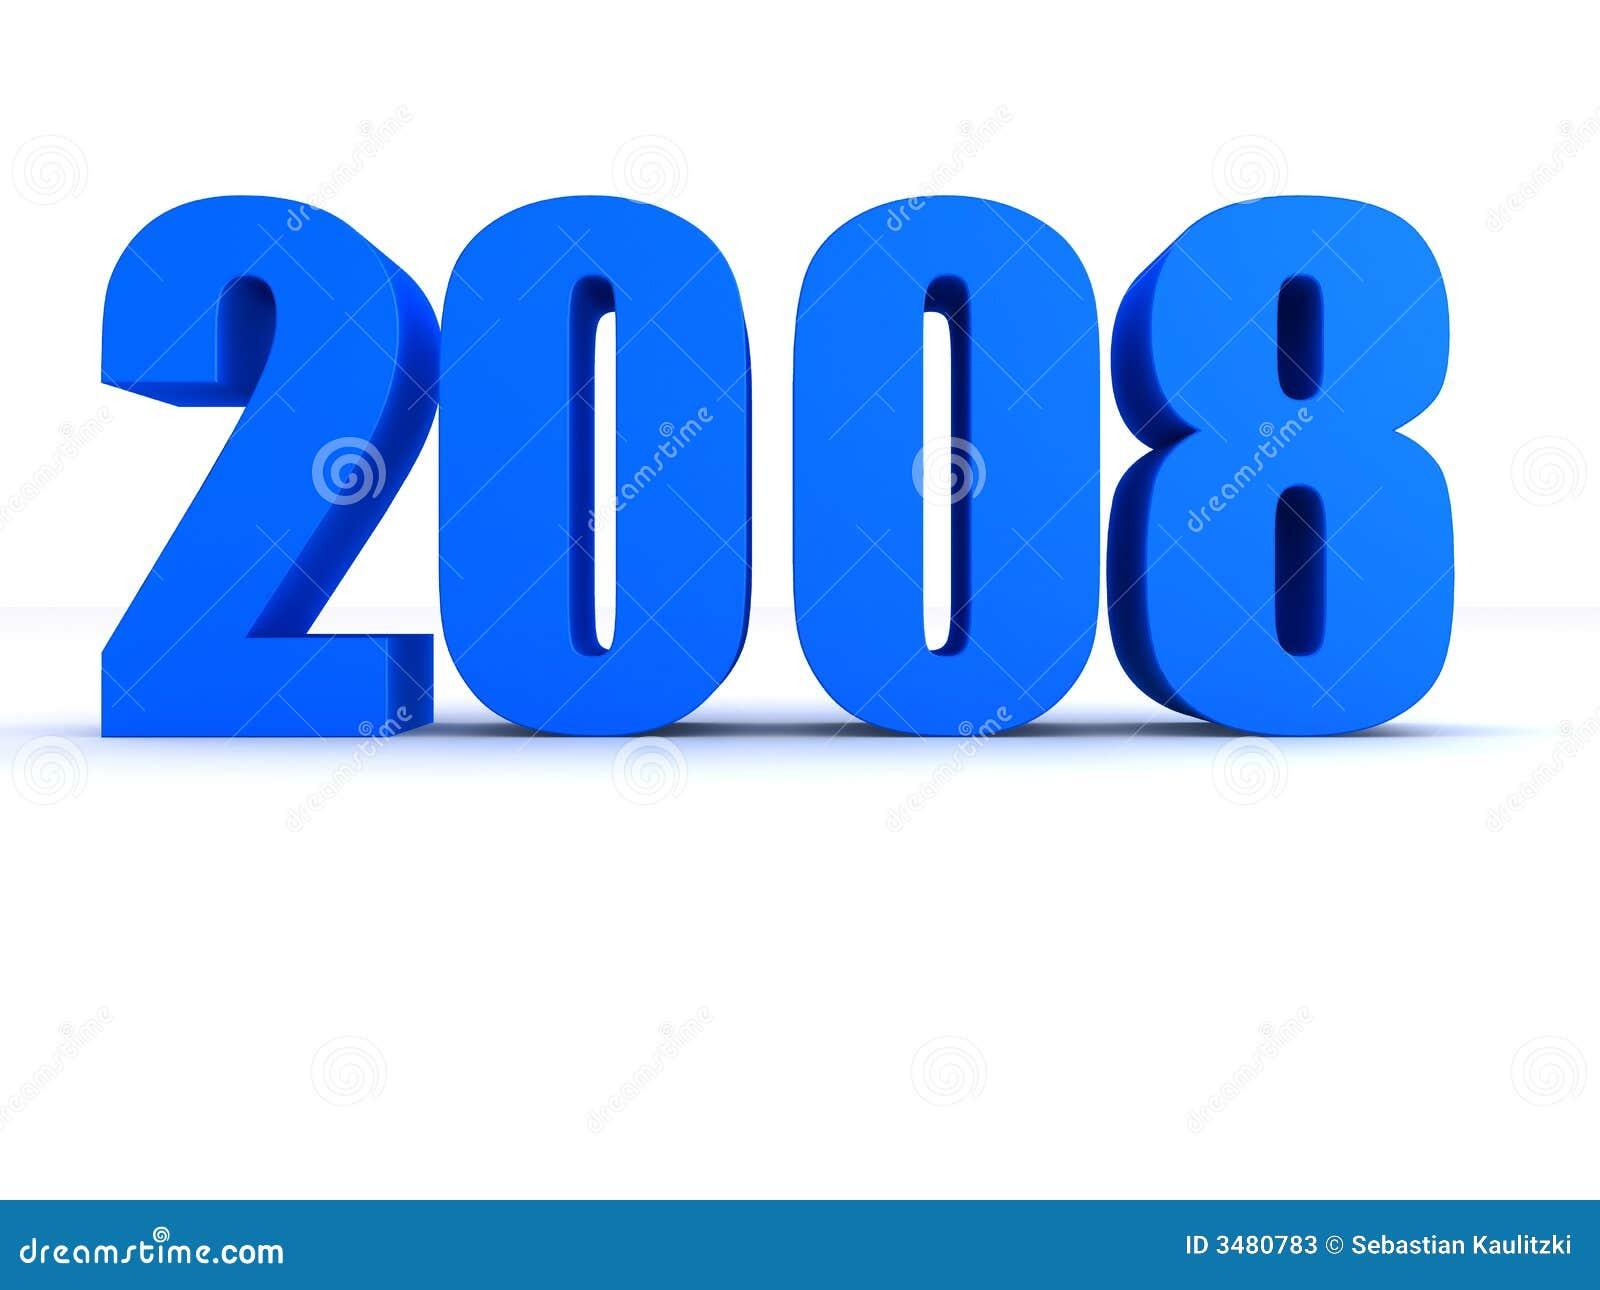 2008 Stock Illustrations – 1,524 2008 Stock Illustrations ...